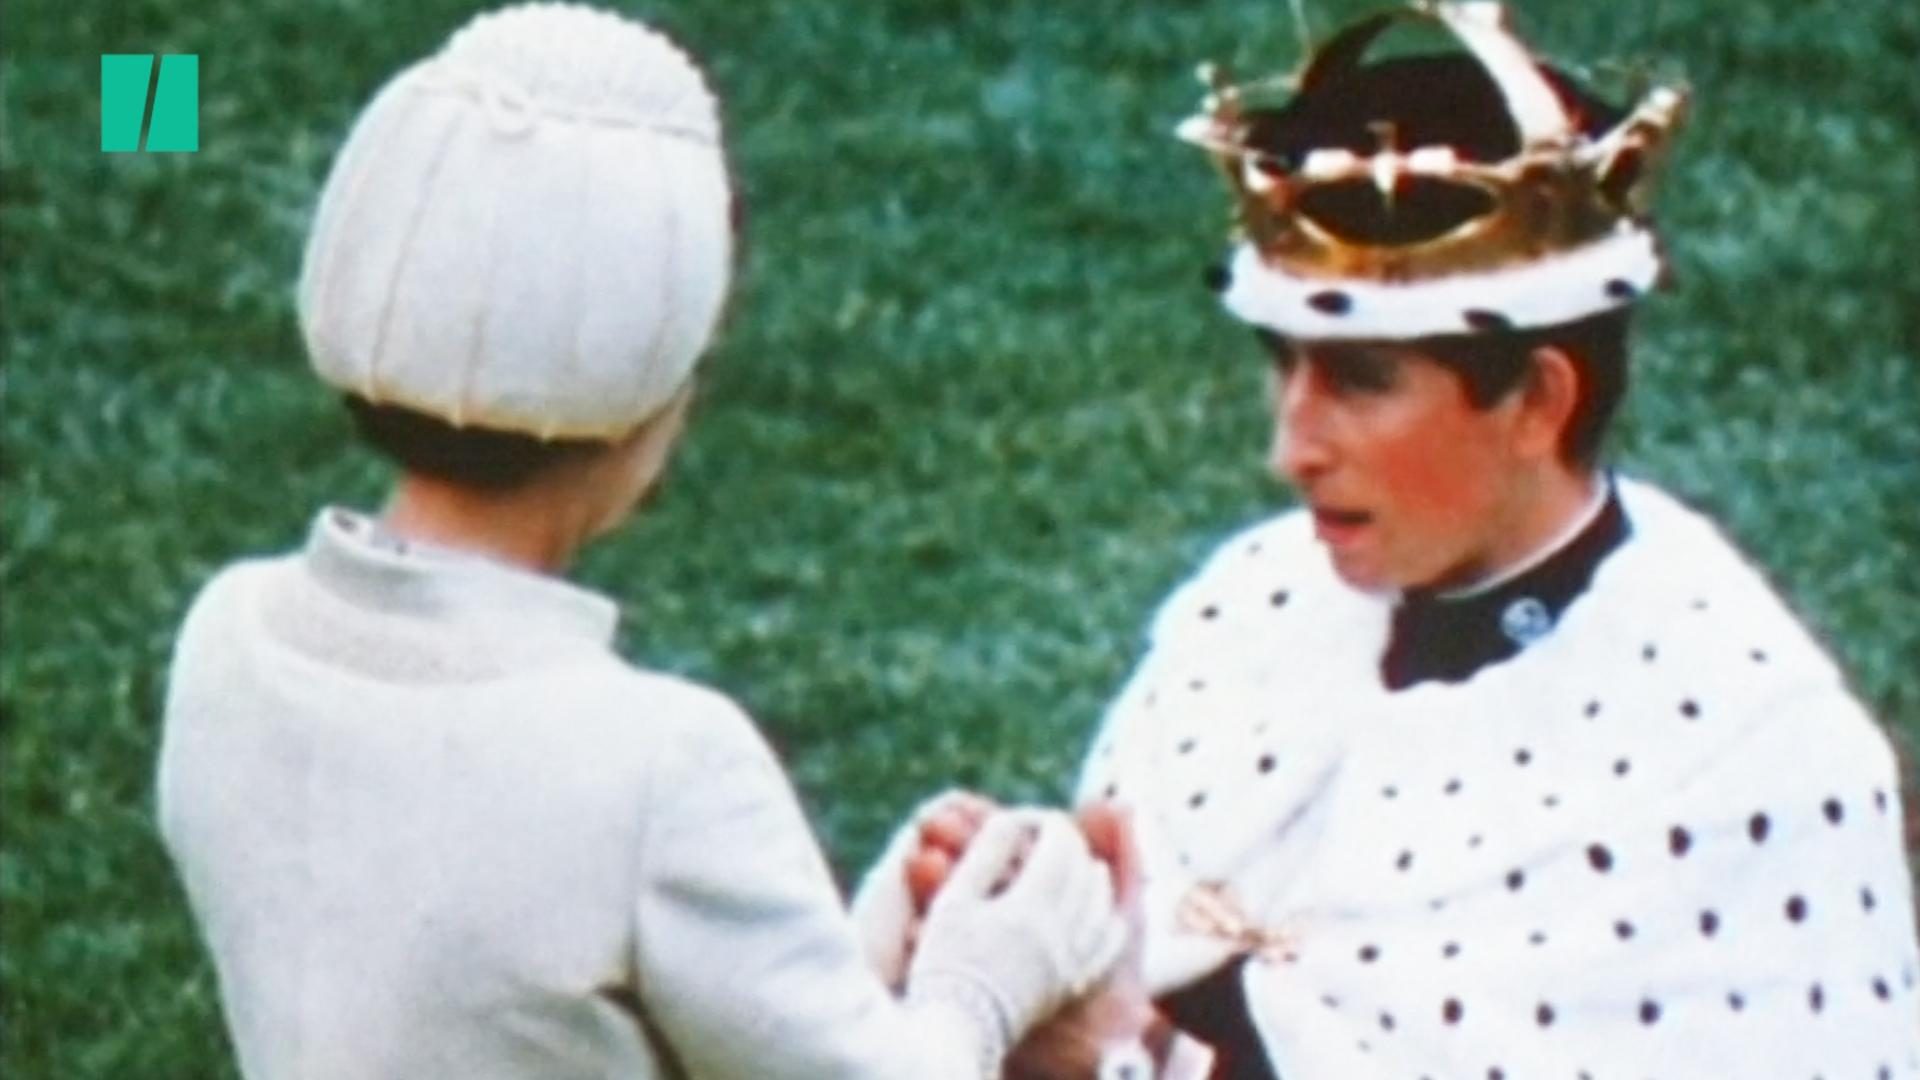 Prince Charles Celebrates 70th Birthday With New Royal Family Photos